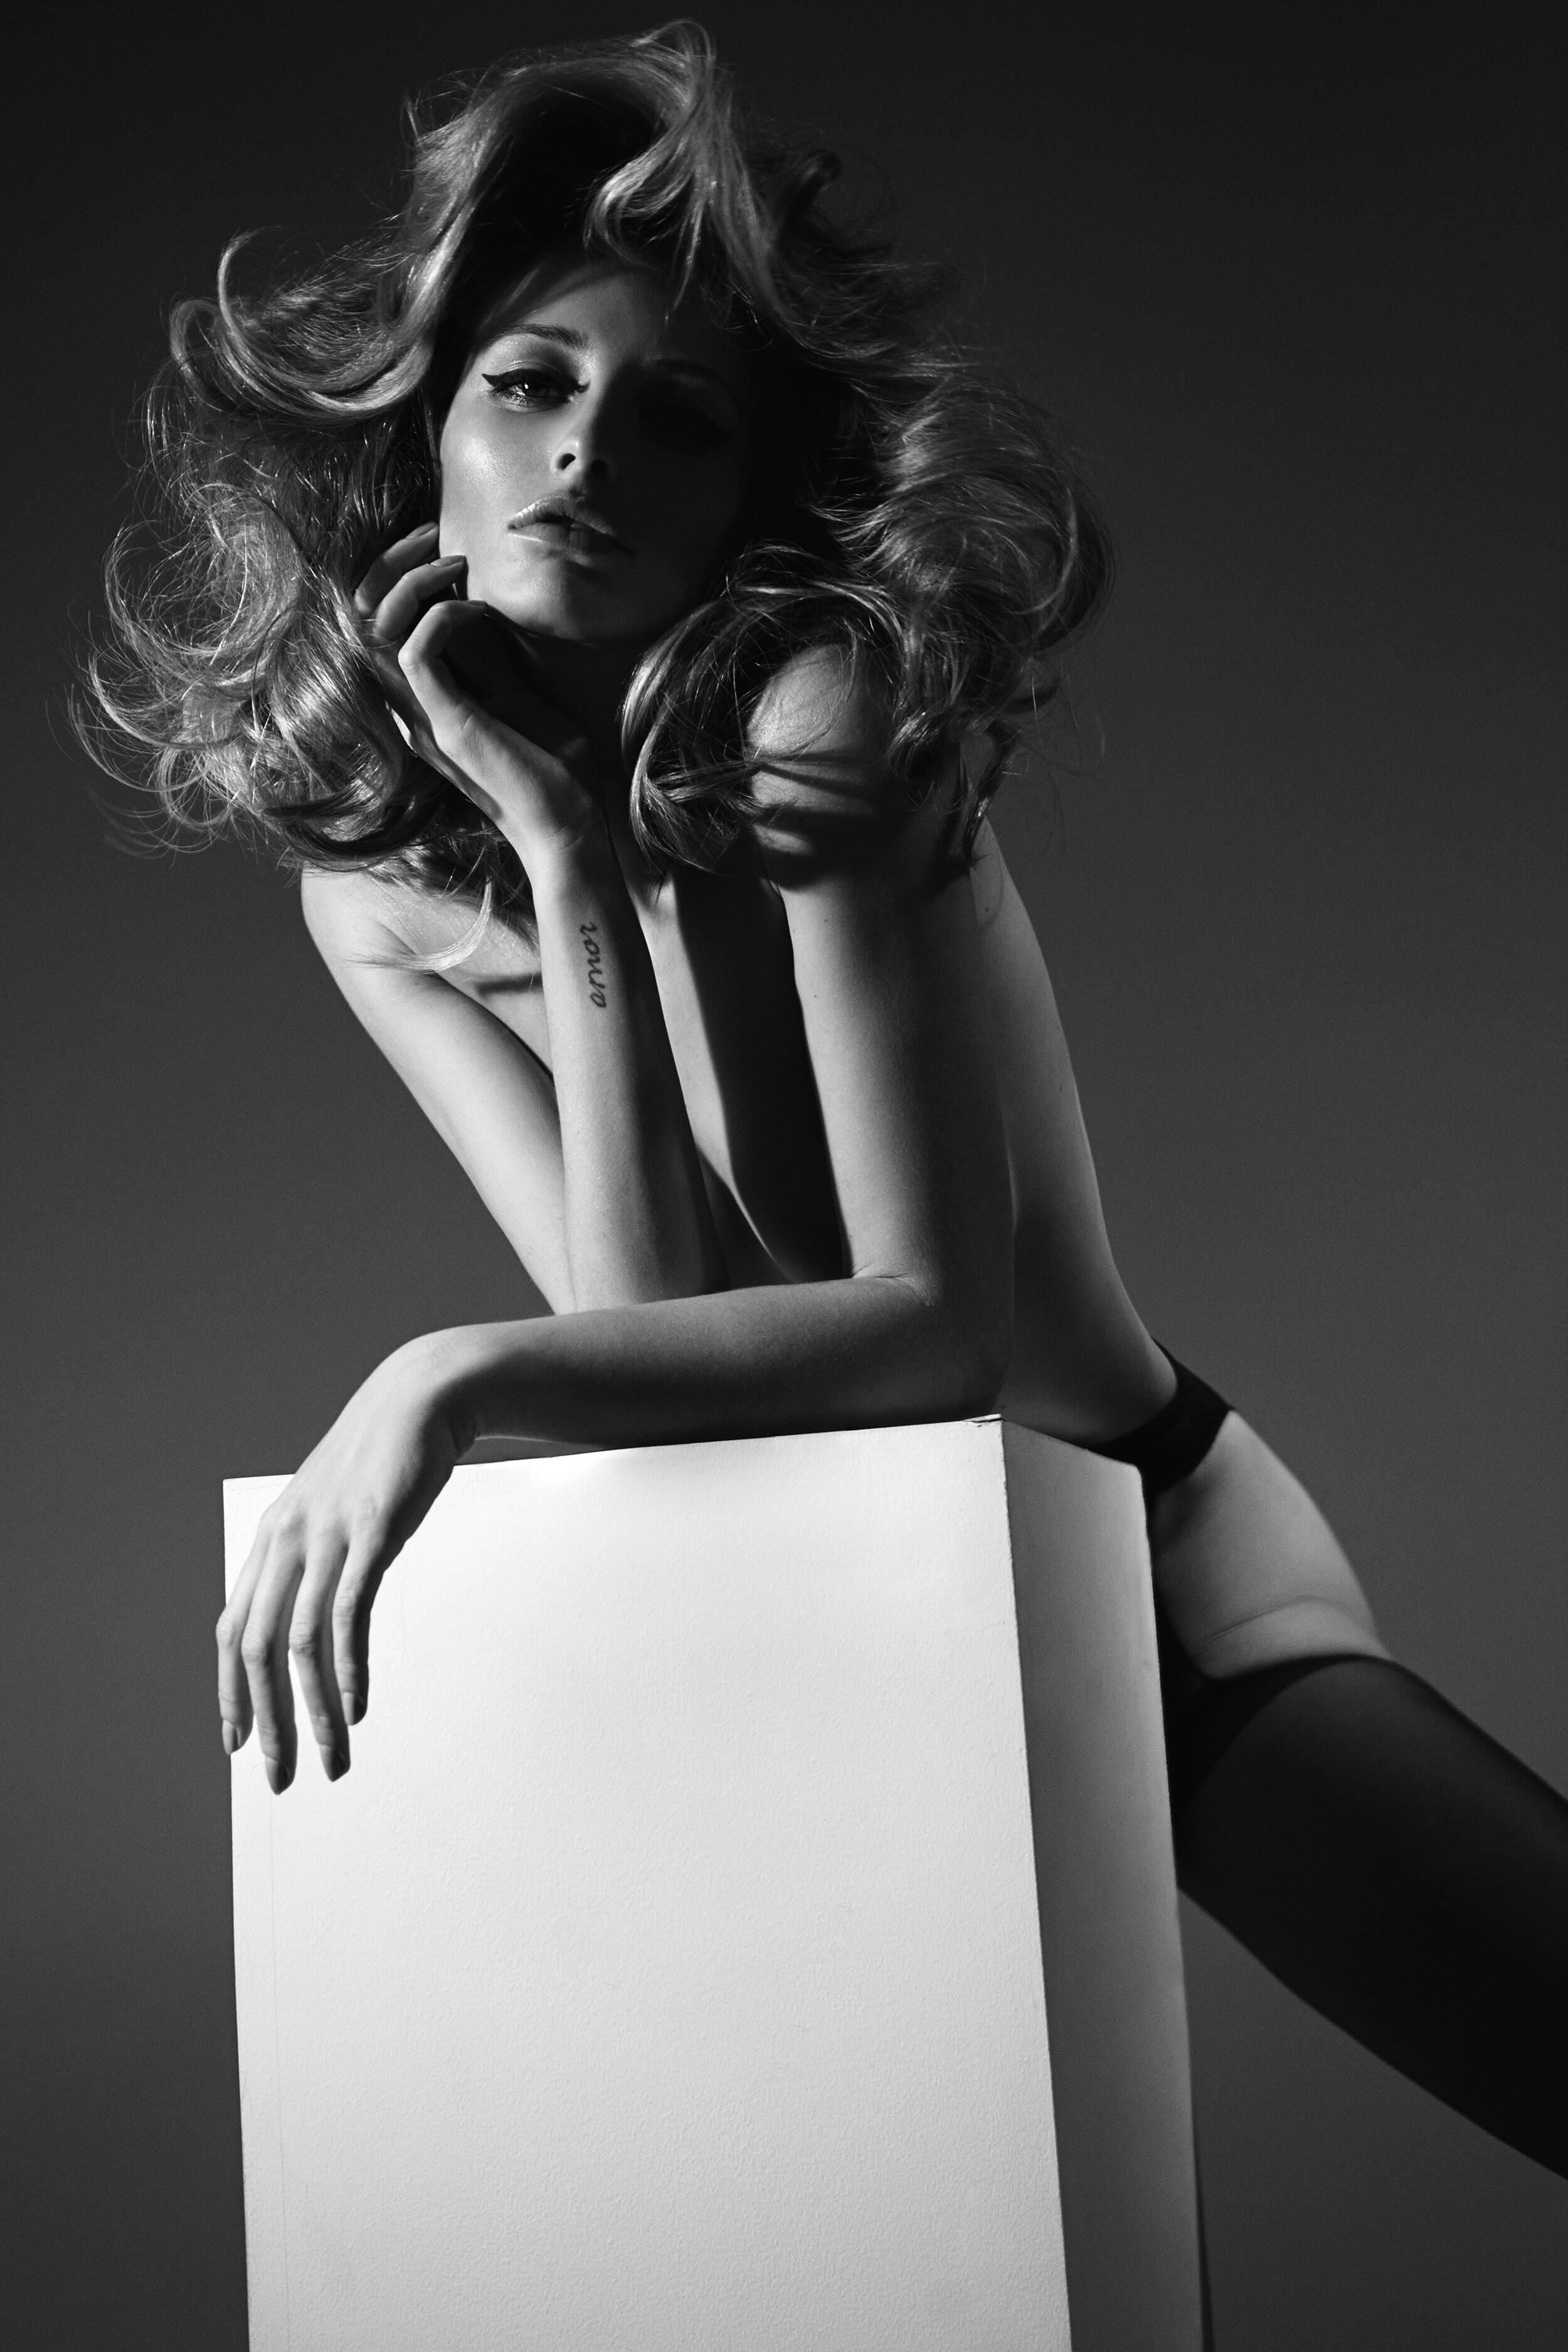 Flavia Lucini - Page 28 - Female Fashion Models - Bellazon